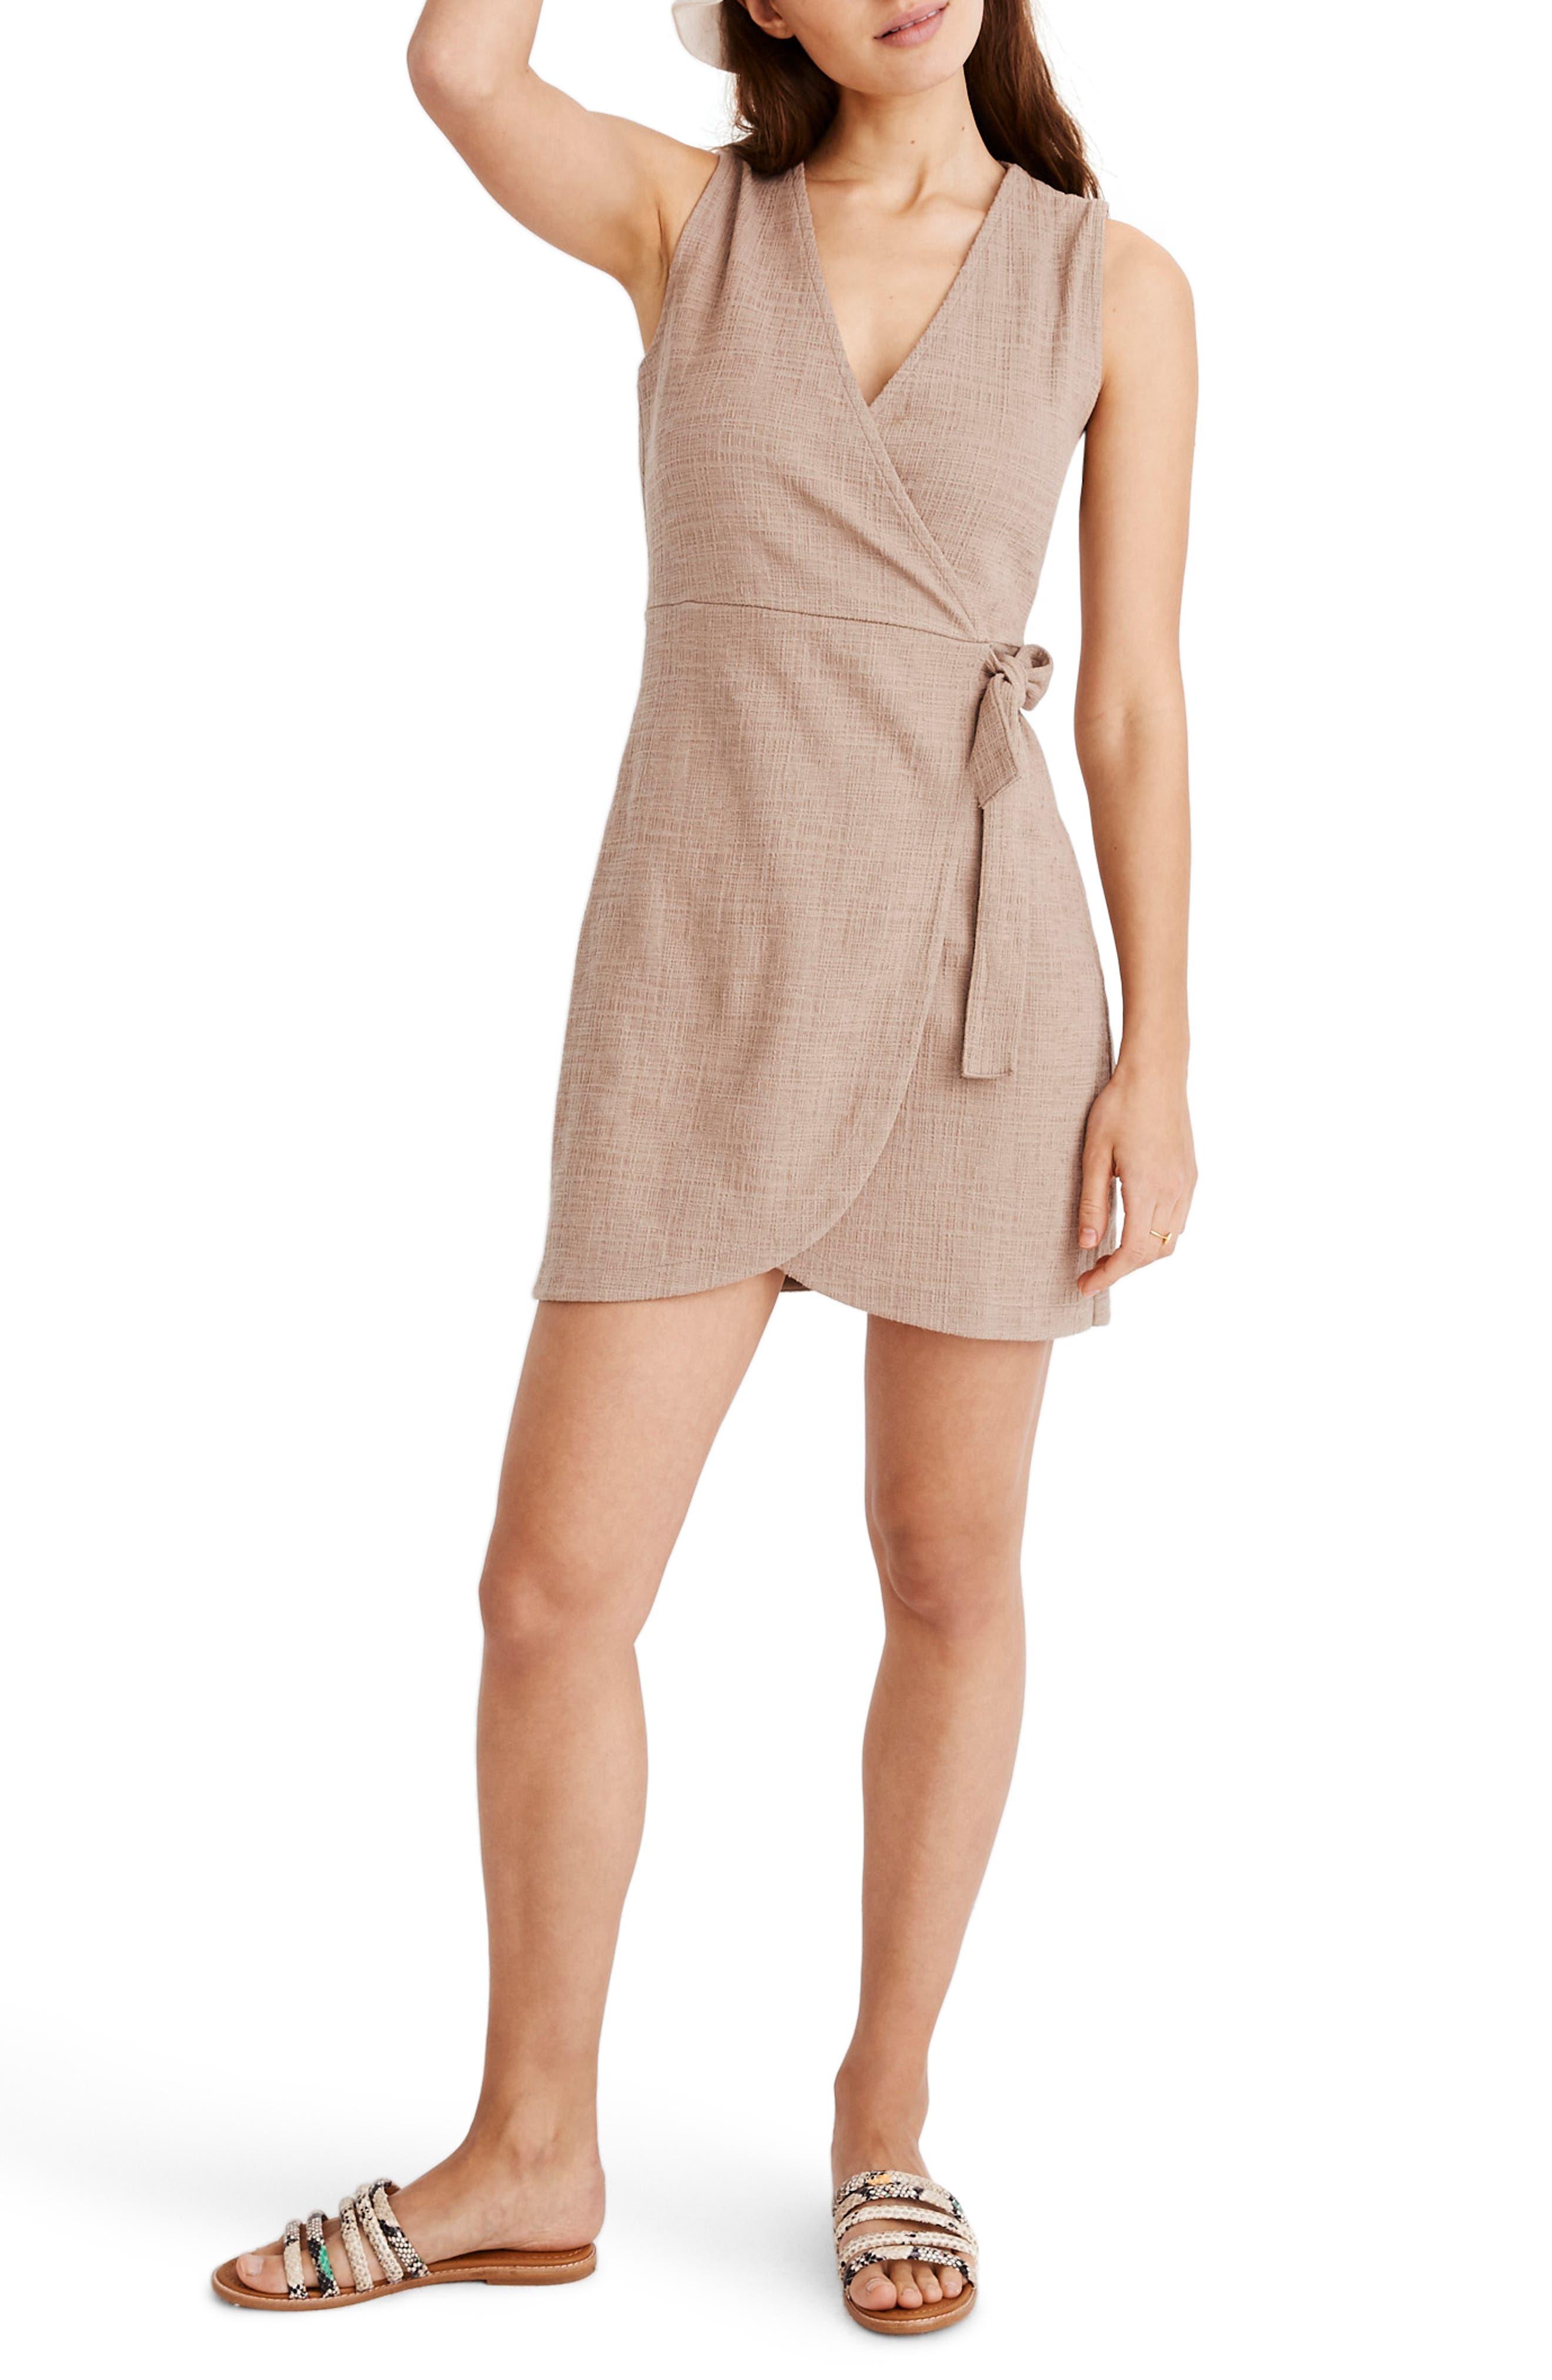 MADEWELL Texture & Thread Side Tie Minidress, Main, color, TELLURIDE STONE